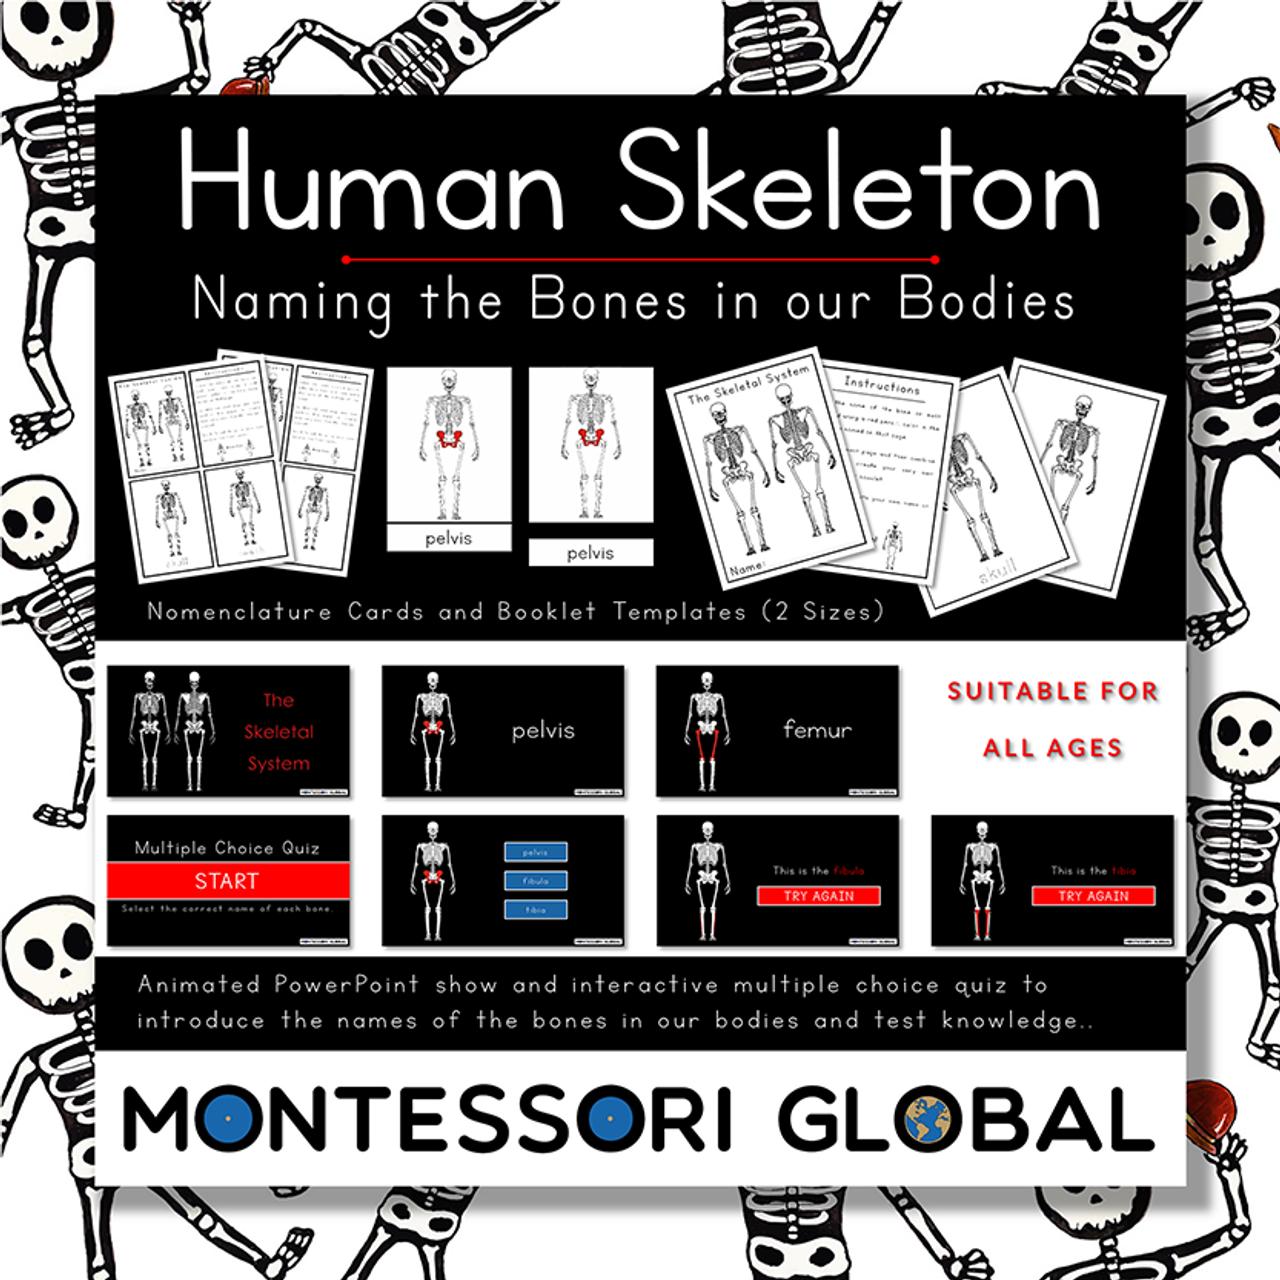 Skeletal System Powerpoint Interactive Quiz Nomenclature Cards Templates